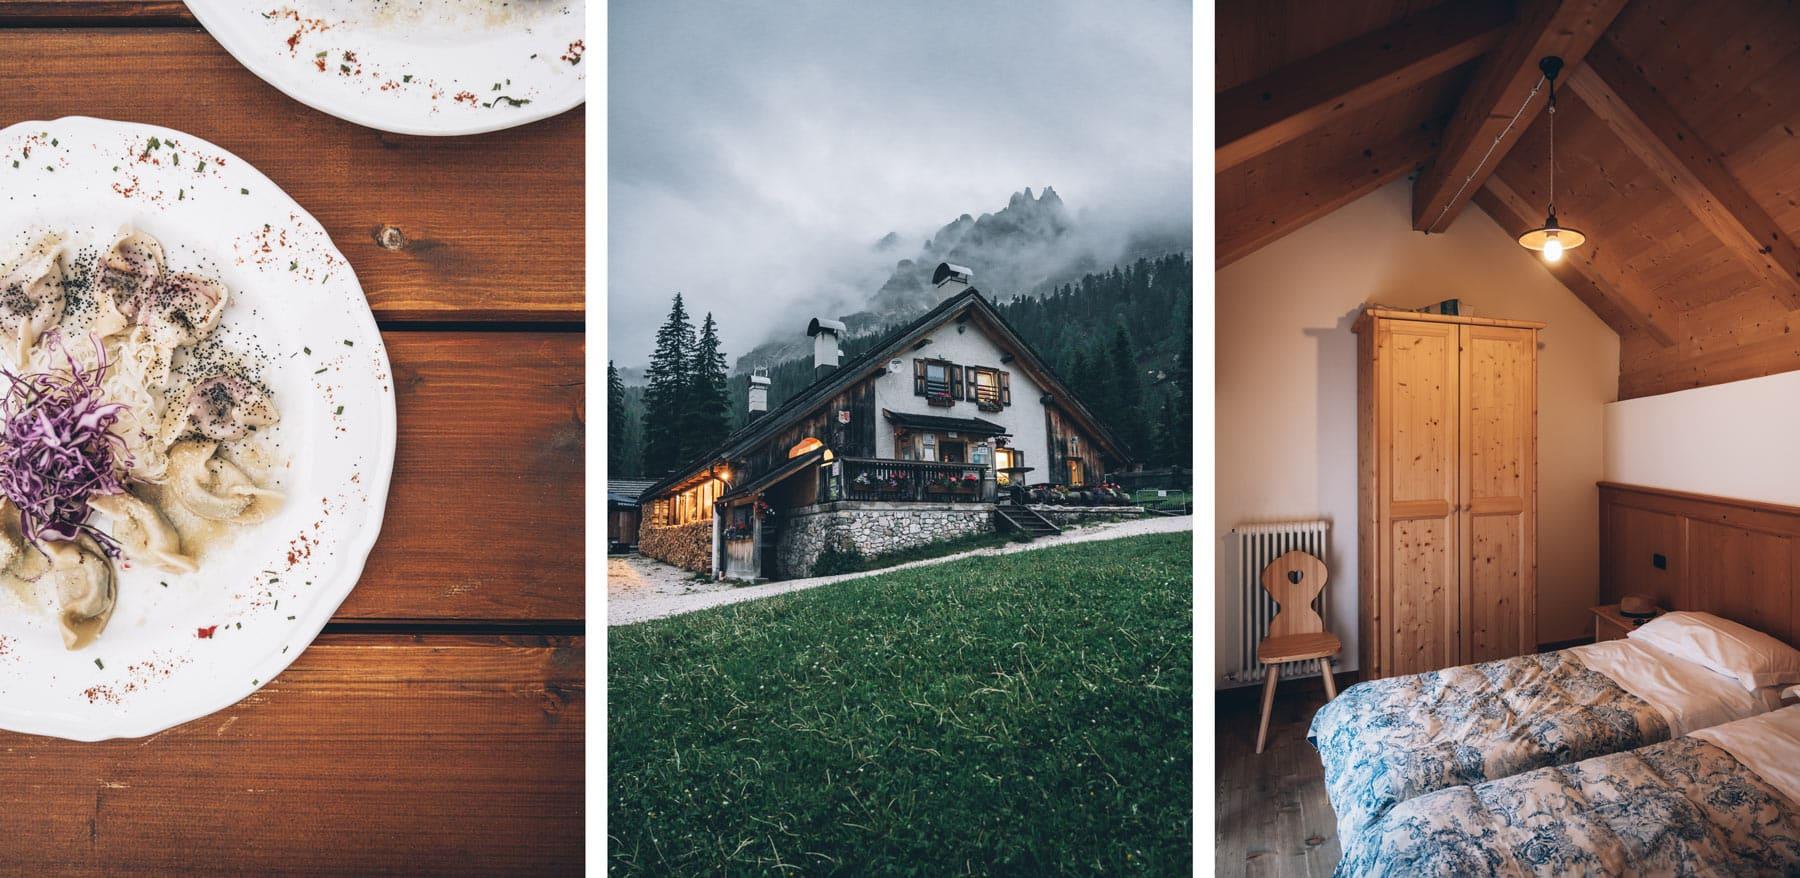 Malga Federa, Cortina